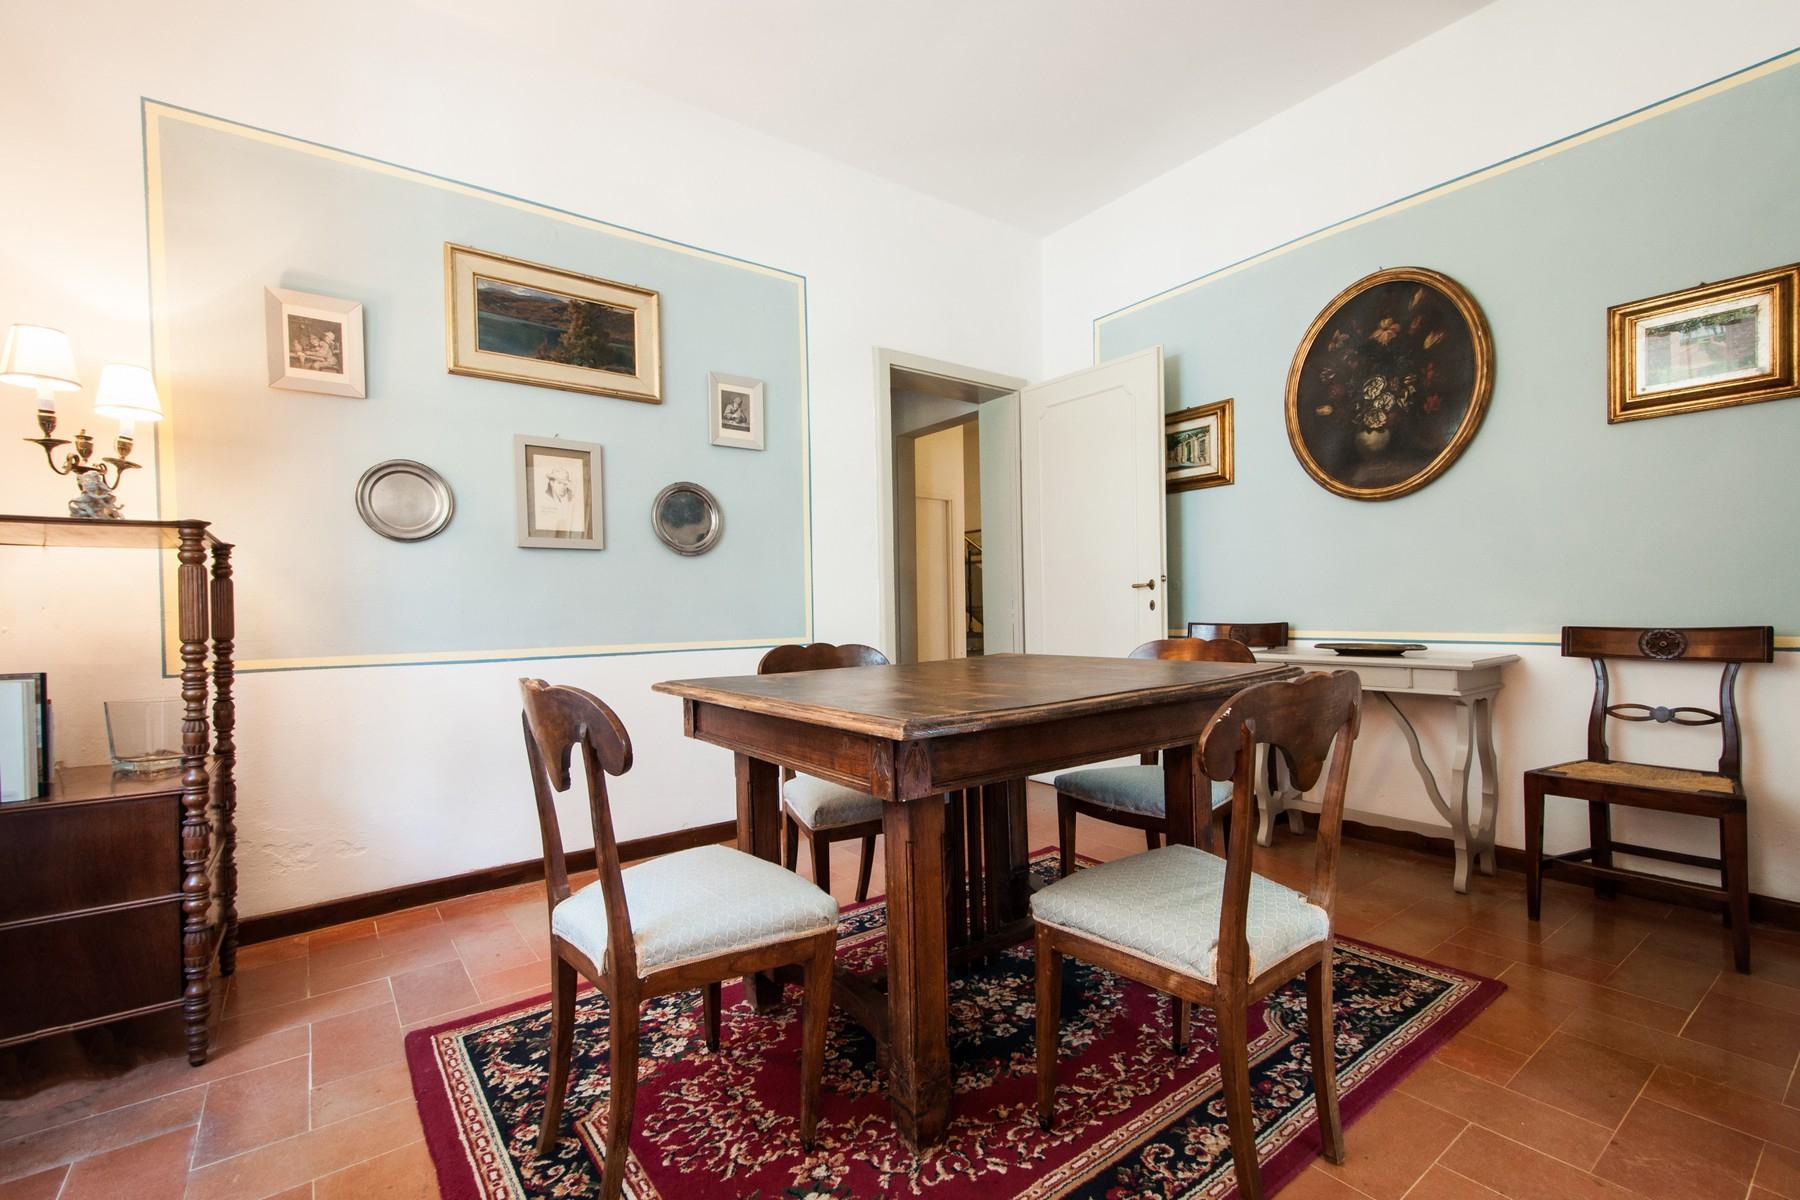 Villa in Vendita a Lucca: 5 locali, 400 mq - Foto 6